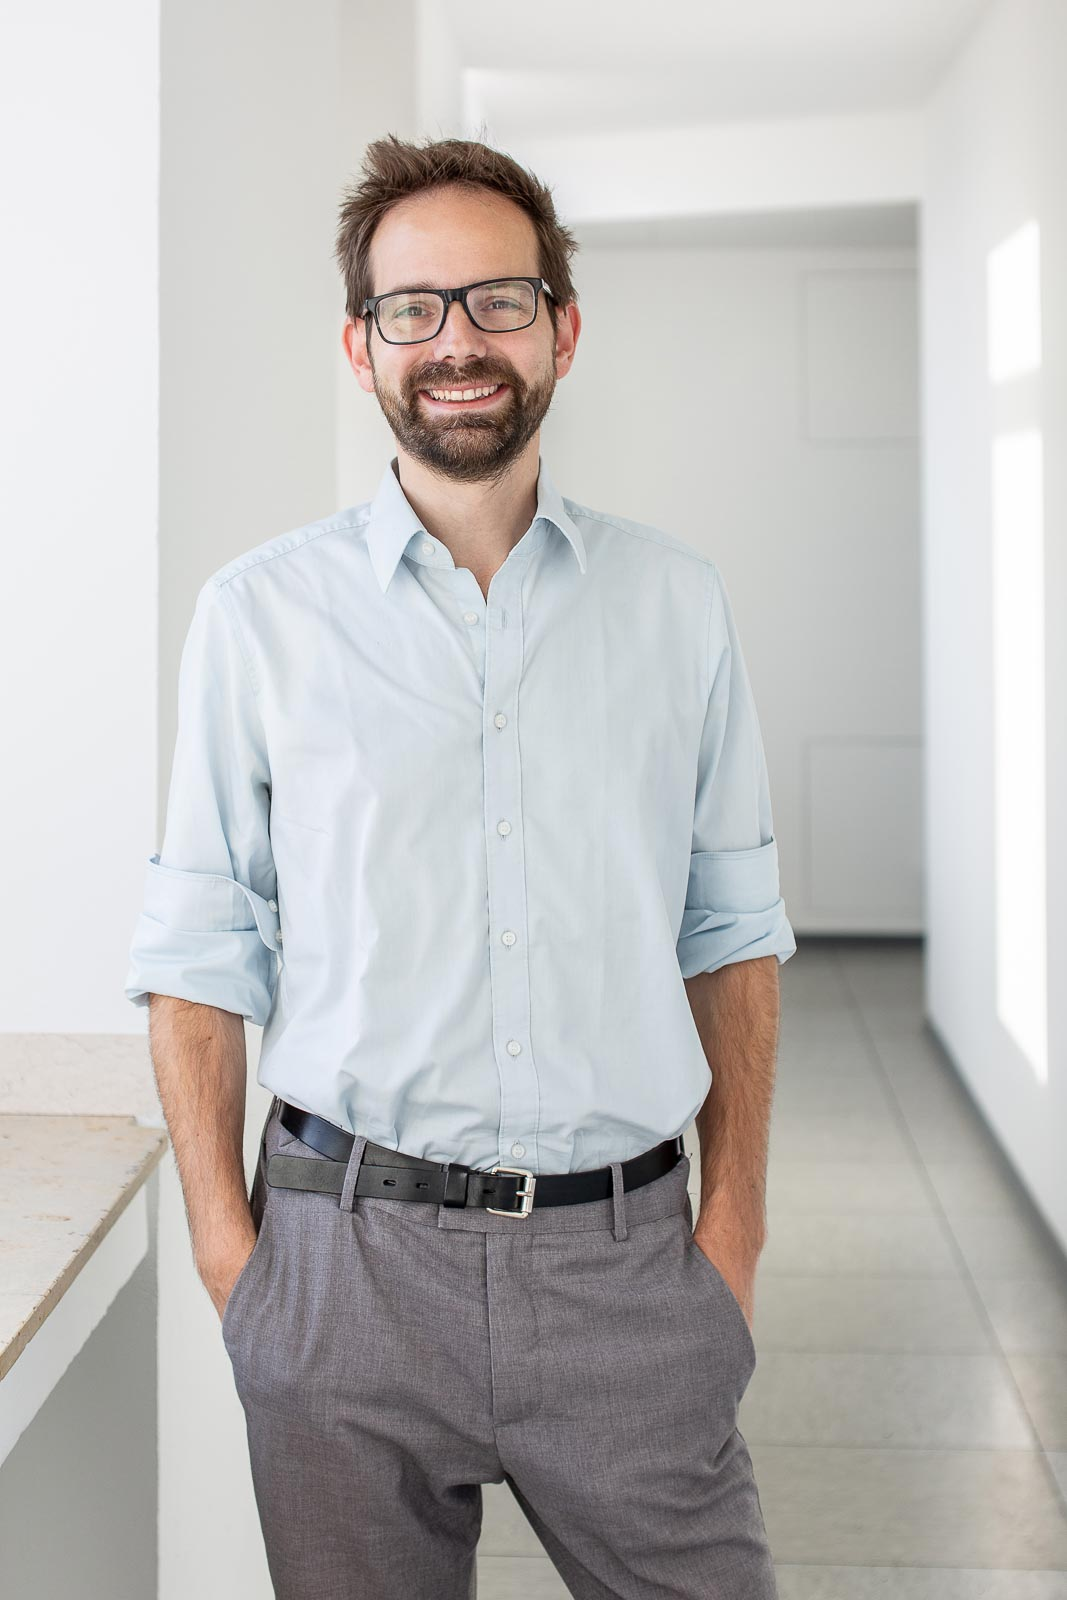 Marcel Kaup